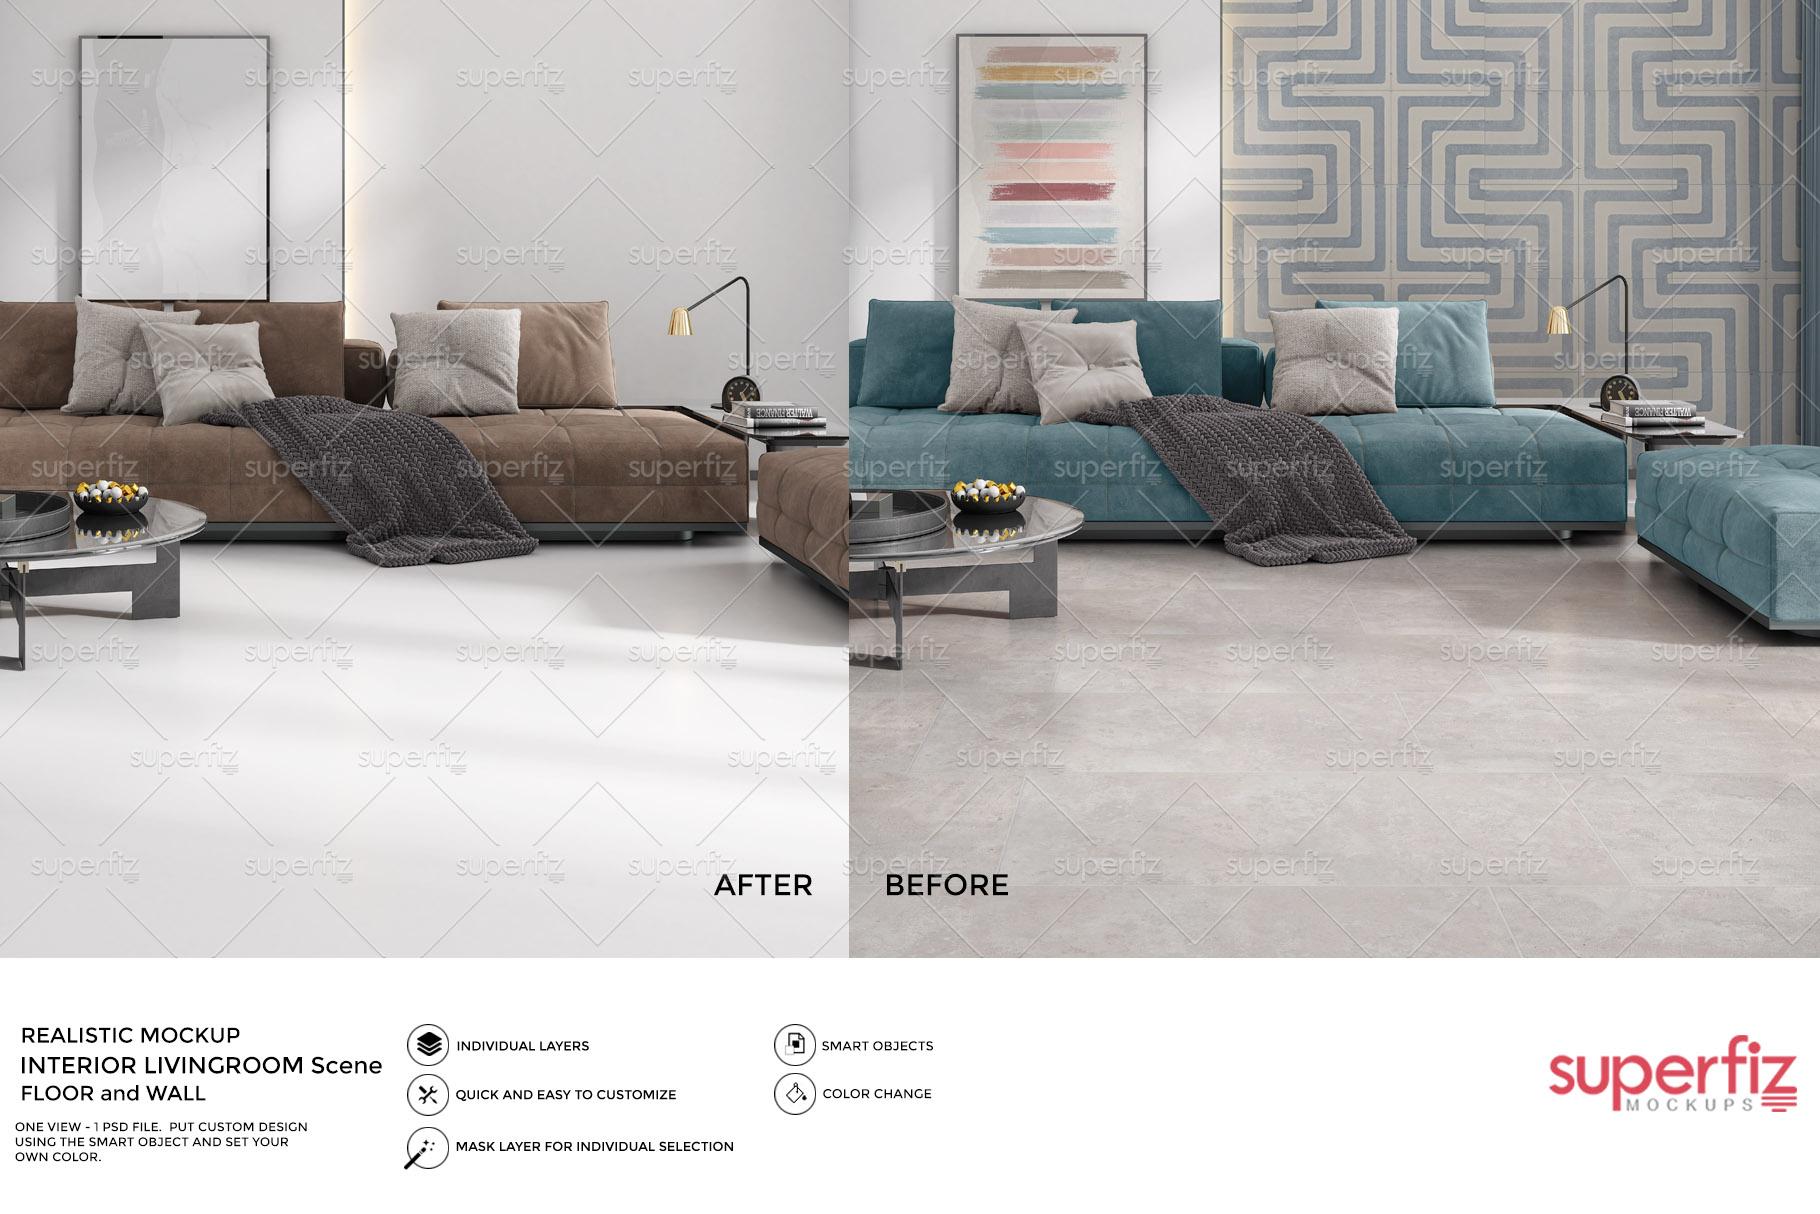 Blank Floor and Wall PSD Mockup Livingroom SM75 example image 2